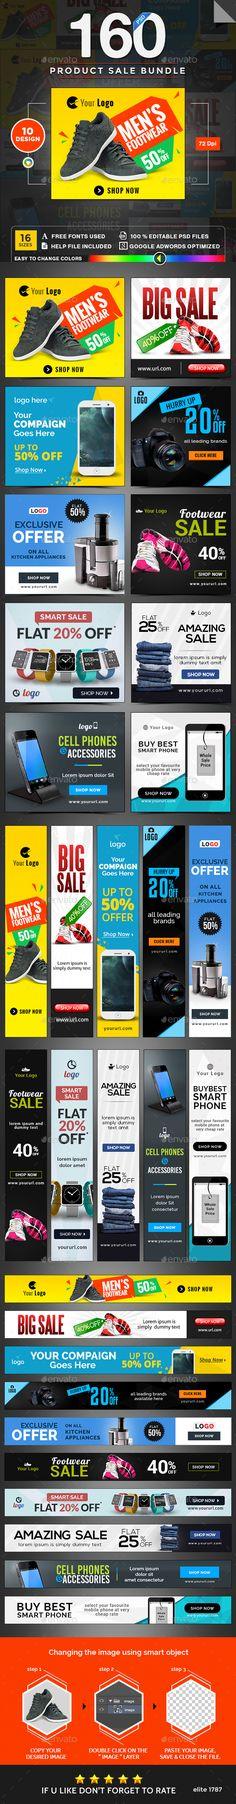 Product Sale Banner Templates PSD Bundle - 10 Sets - 160 Banners